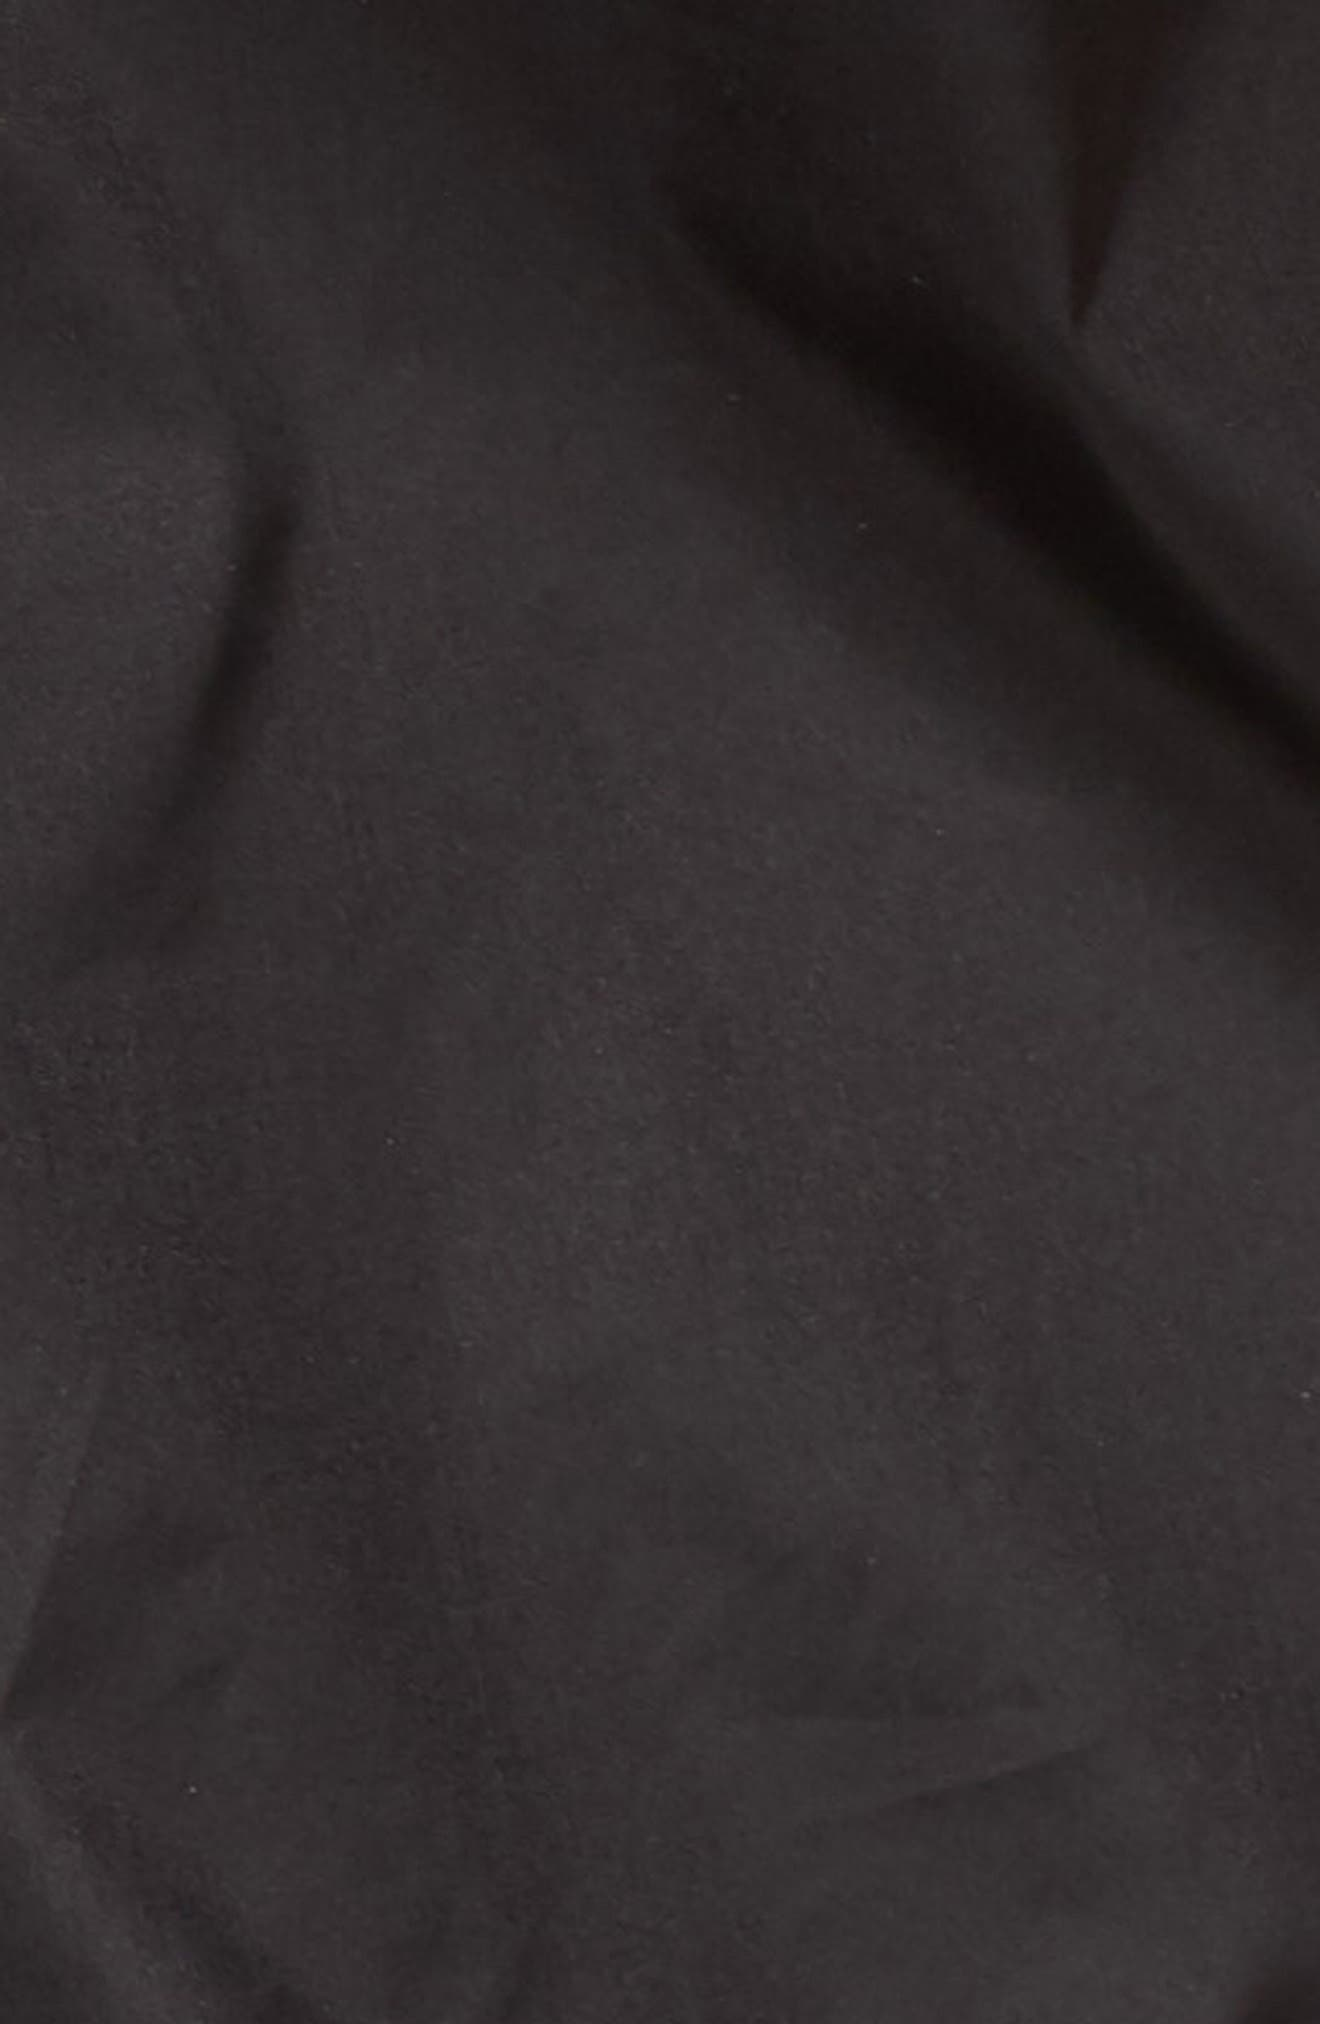 Moonlight Vest,                             Alternate thumbnail 6, color,                             Black